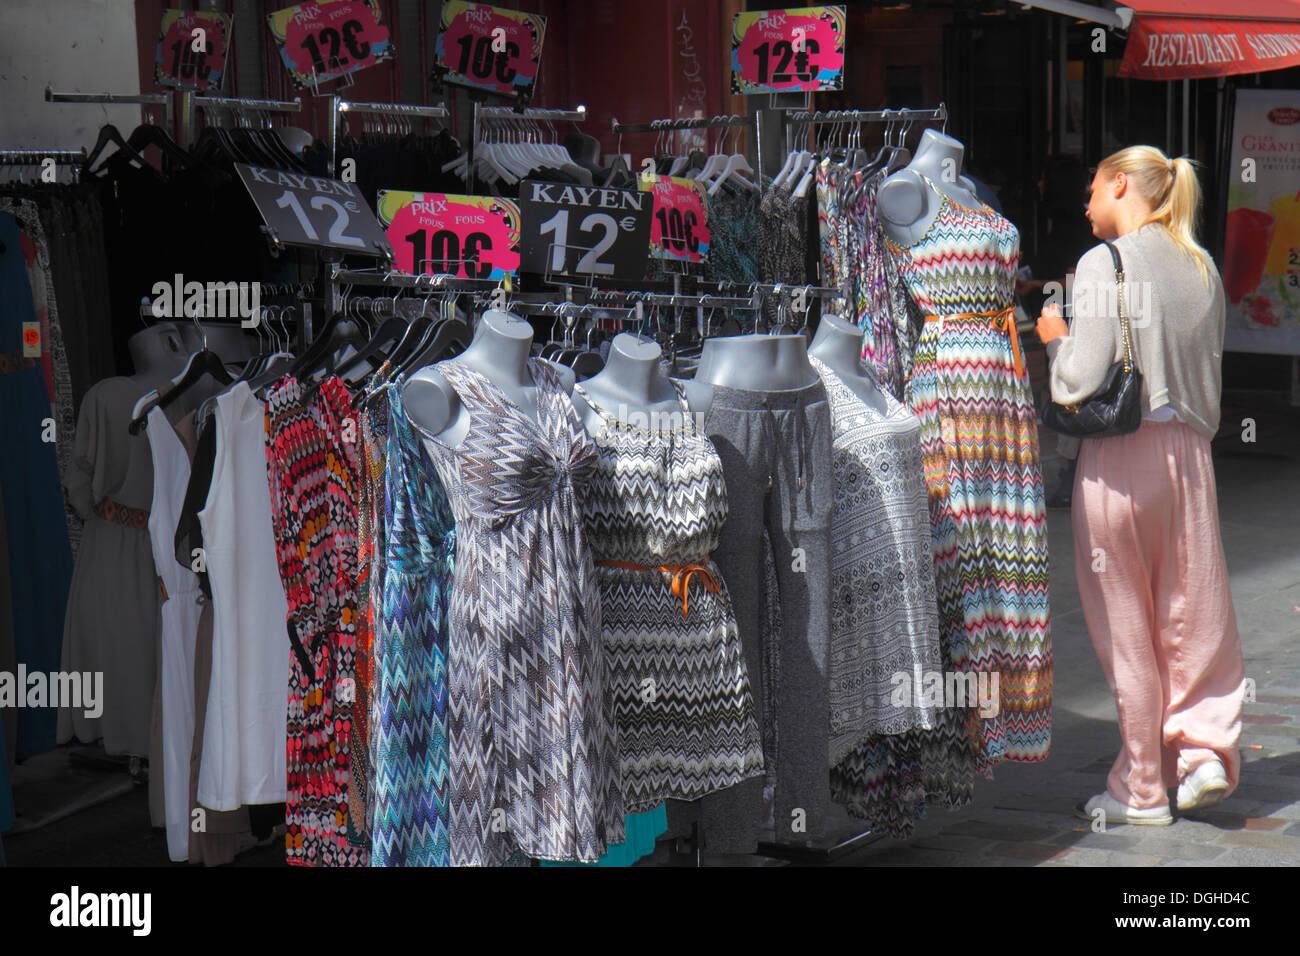 Paris France Europe French 9th arrondissement Rue de Caumartin shopping woman clothing dresses pricing Euros - Stock Image